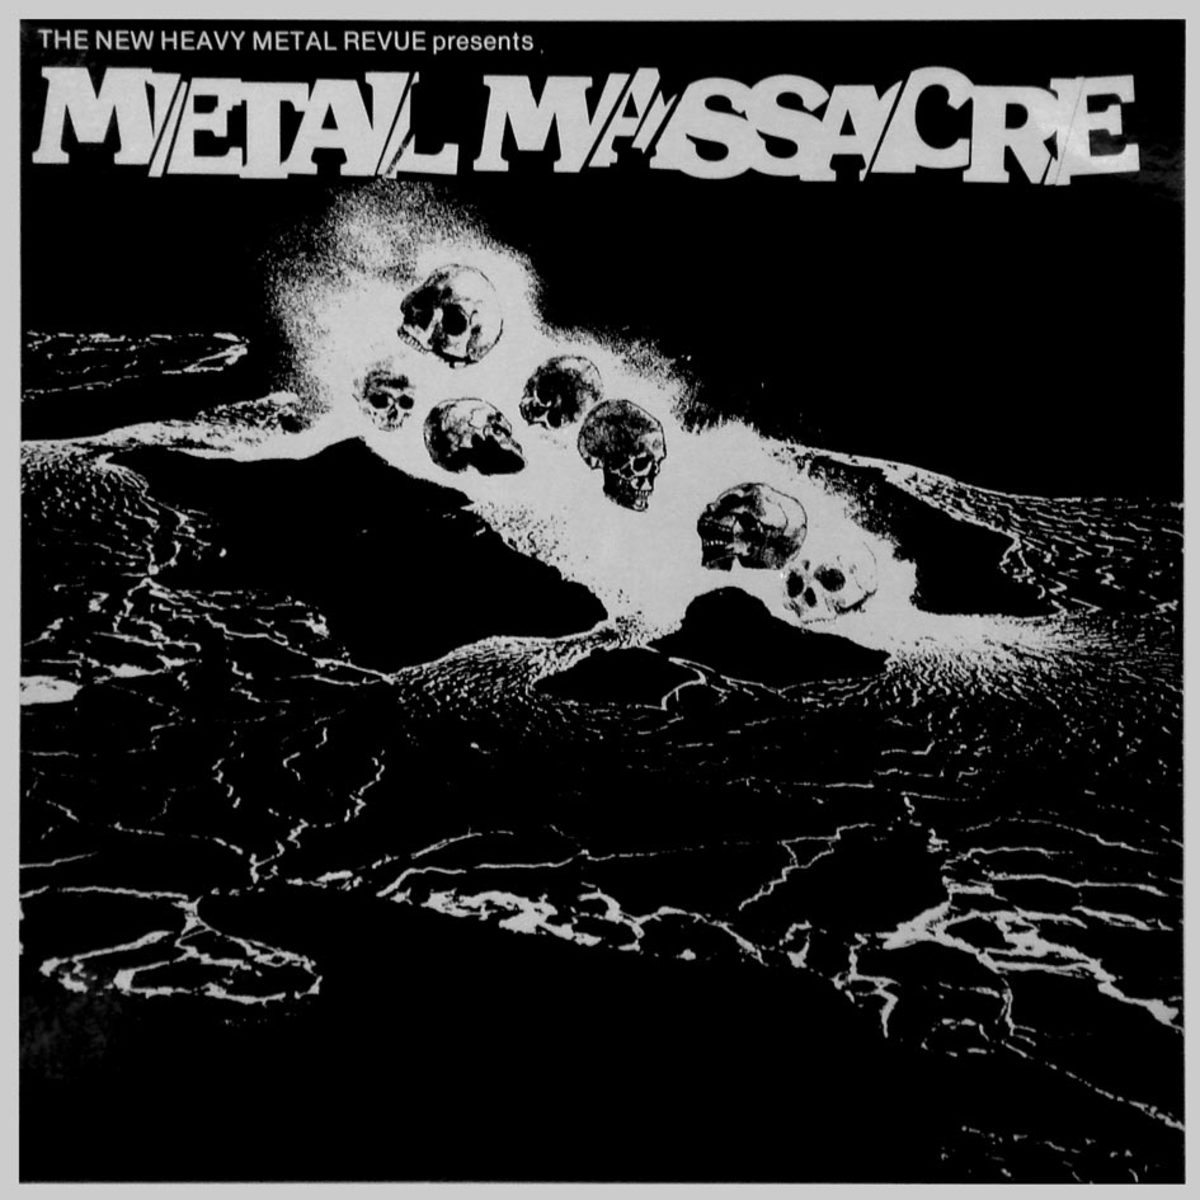 revisiting-metal-massacre